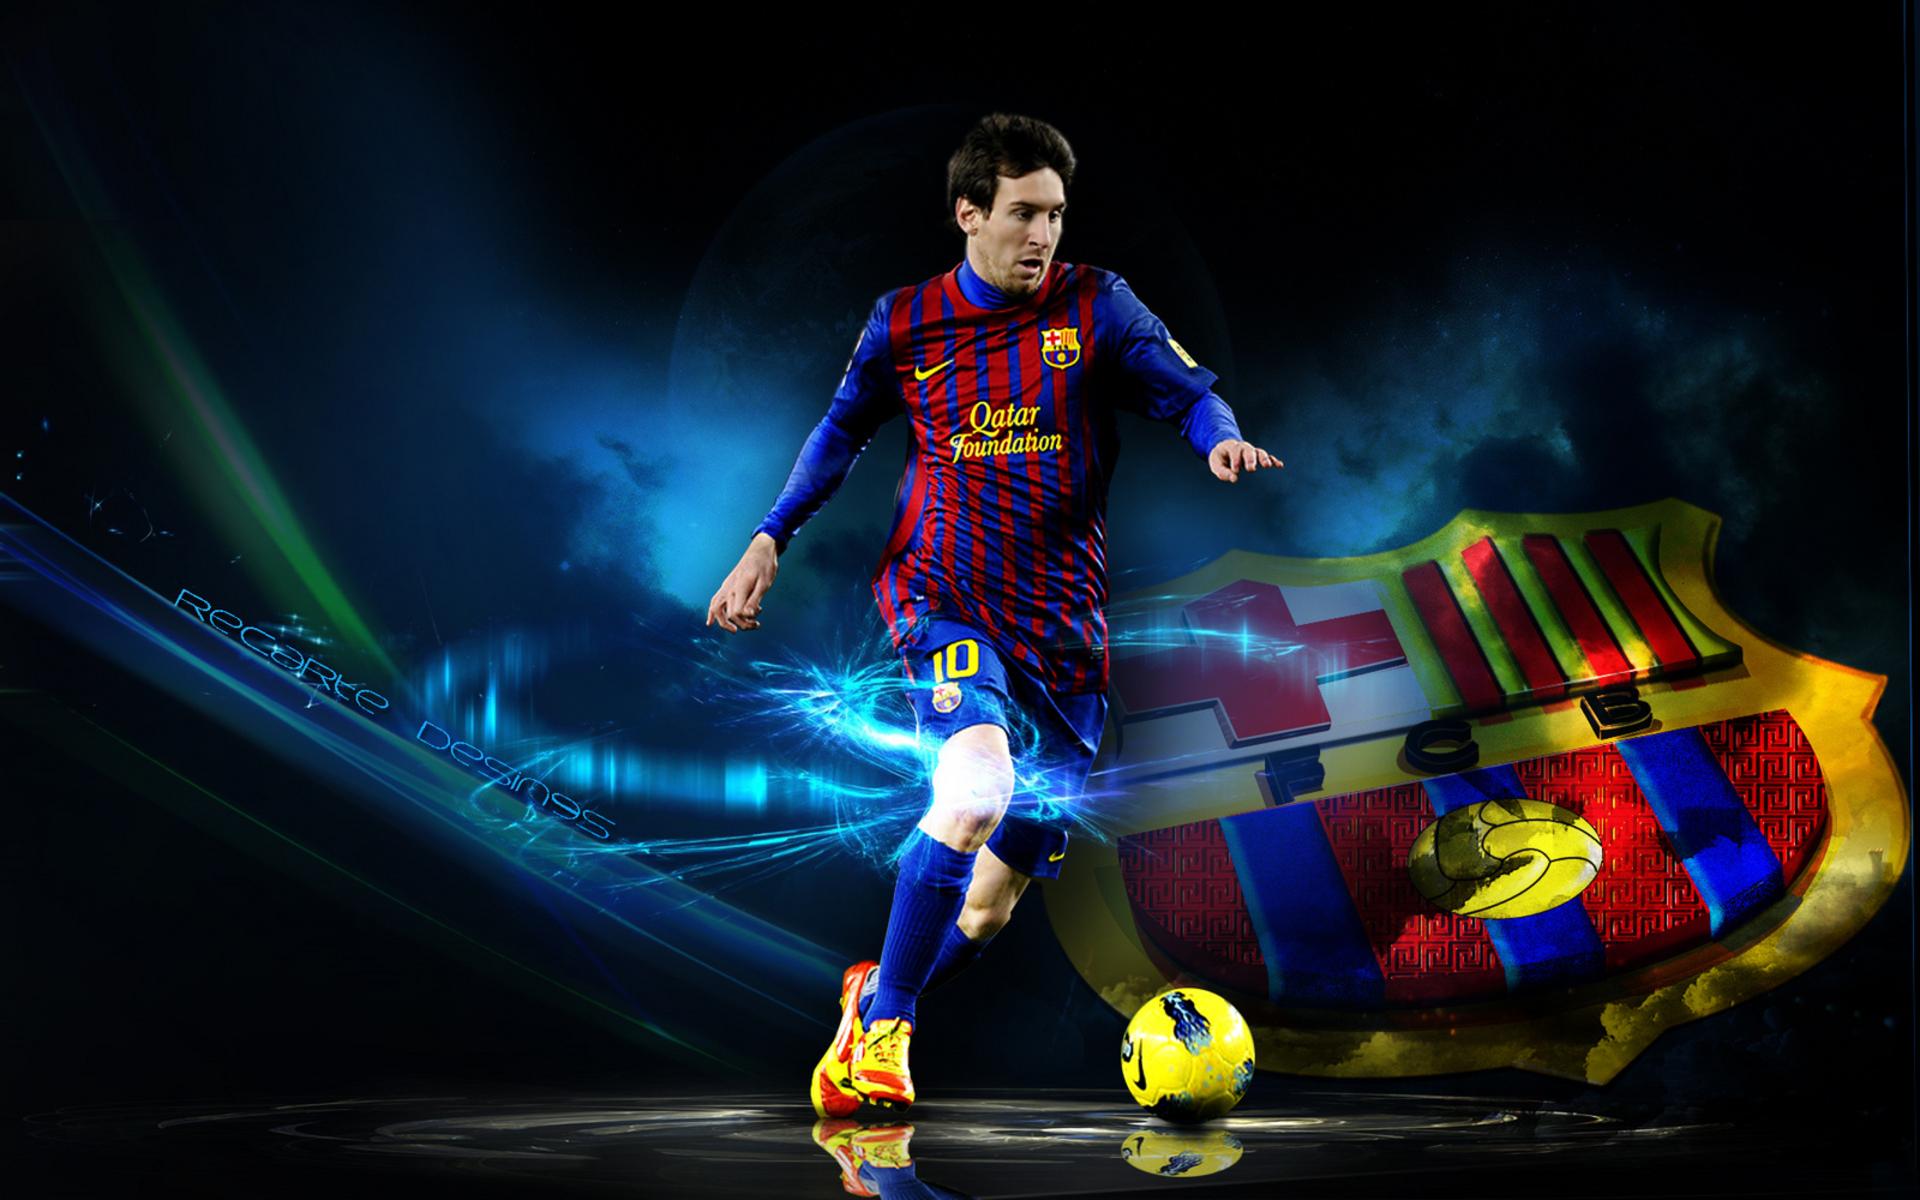 Football Wallpaper Messi 1920x1200 Download Hd Wallpaper Wallpapertip